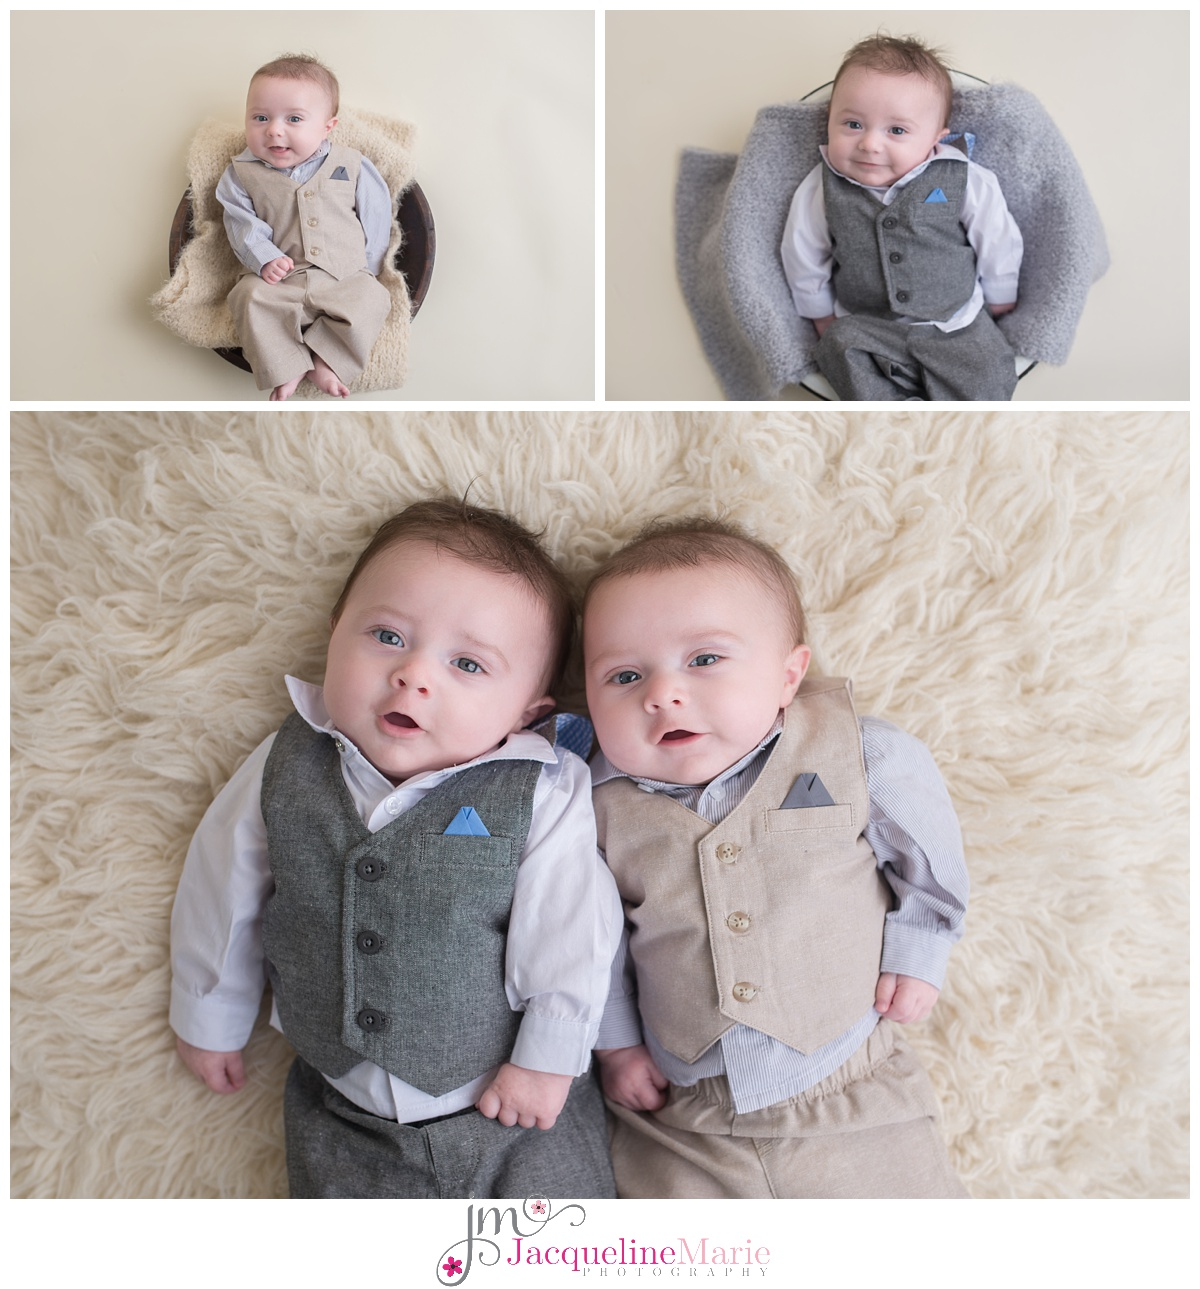 Columbus Ohio Photographer | Twin boys | Columbus baby photographer | Columbus twin photography | Siblings | Brothers